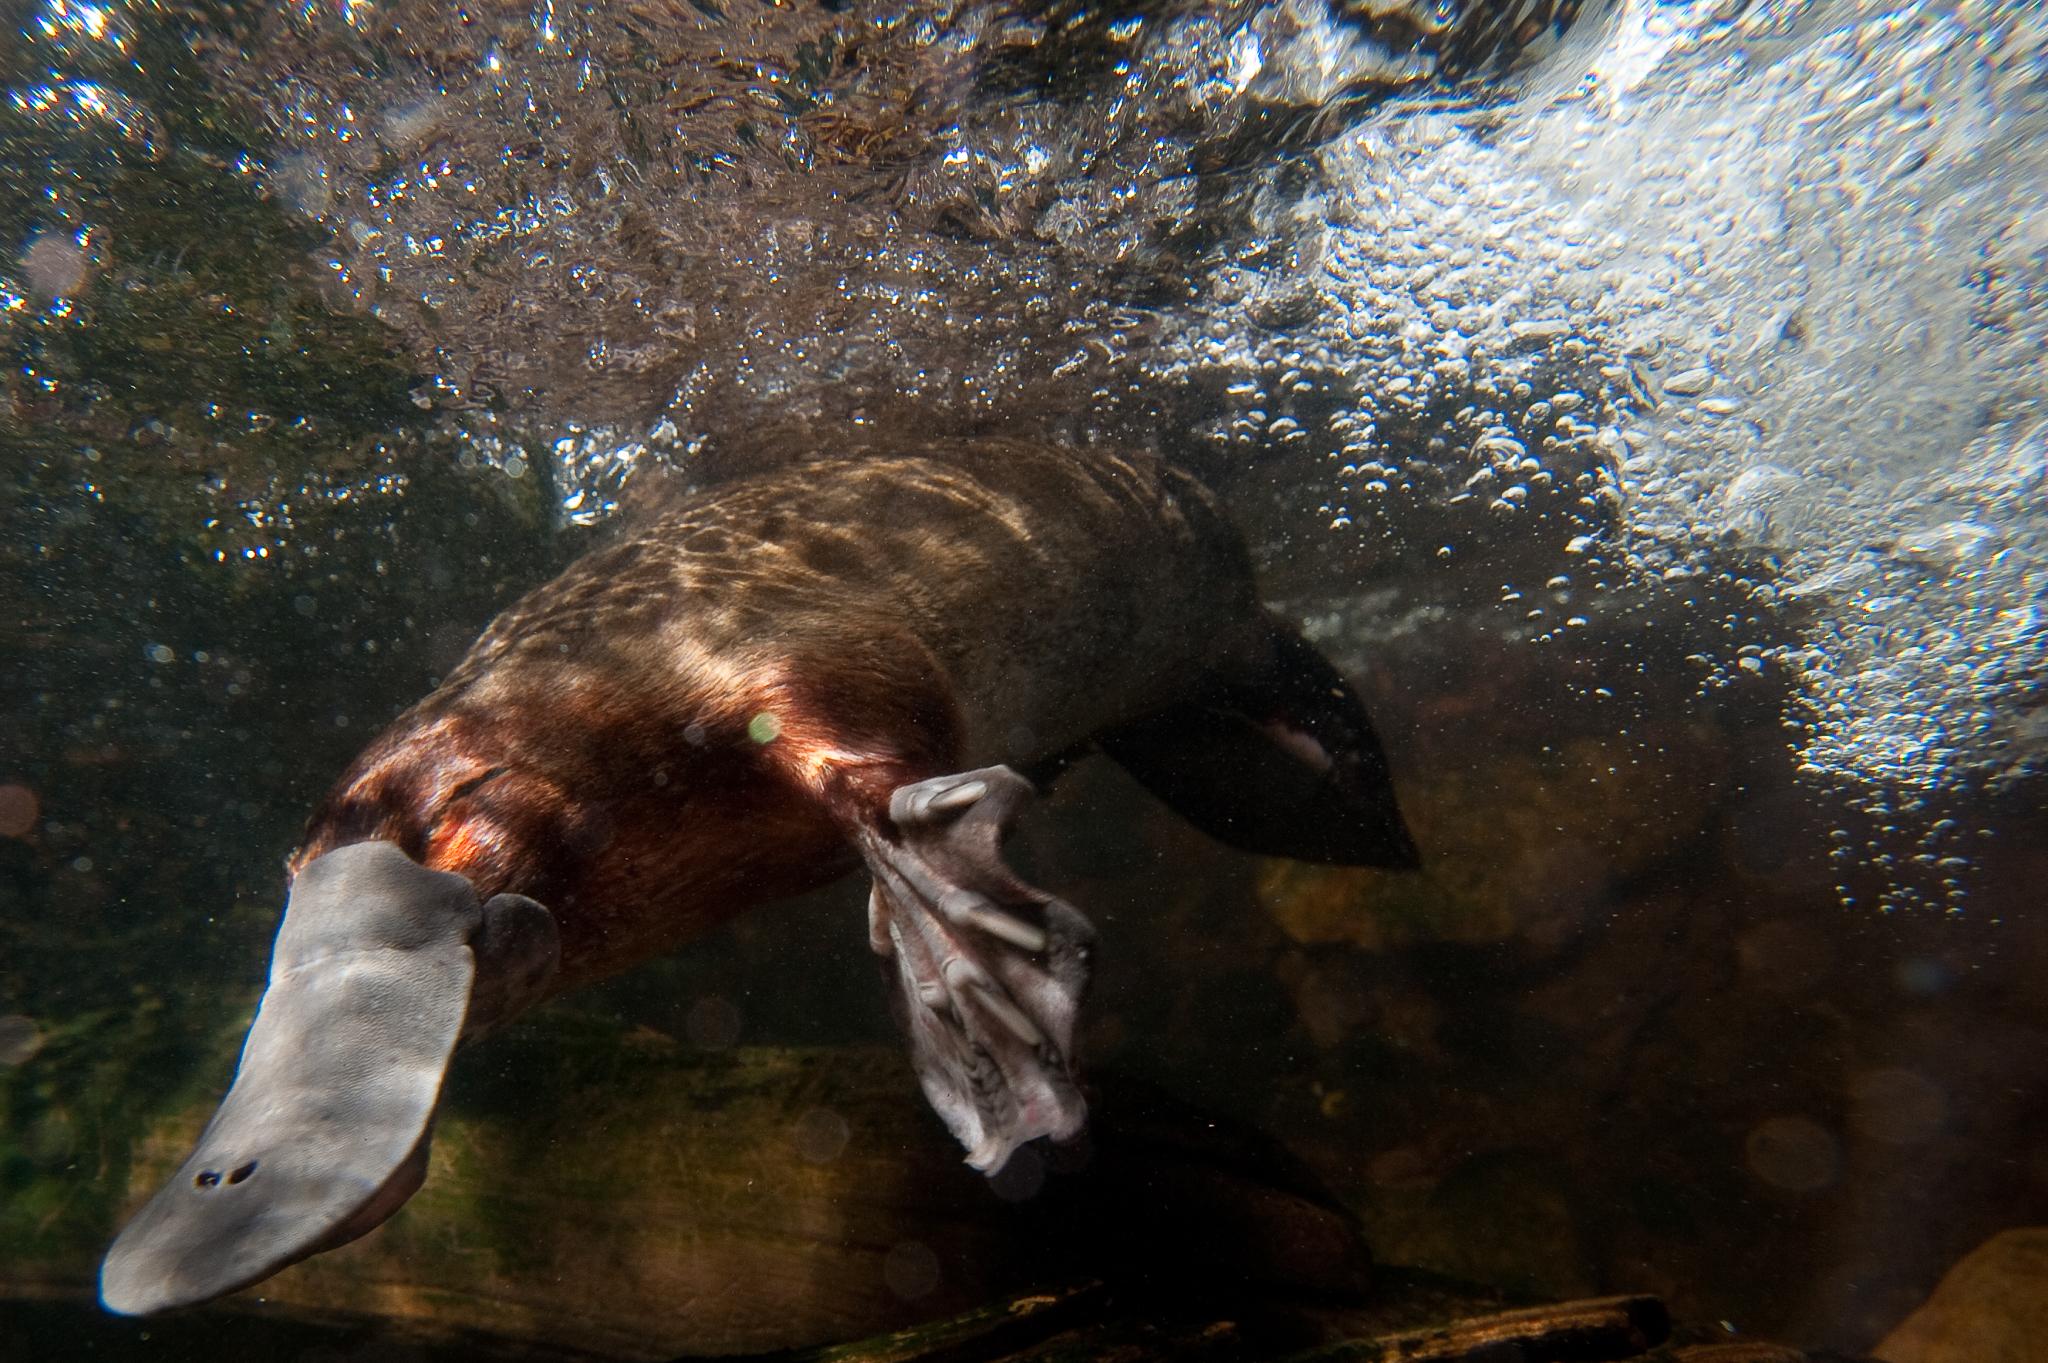 A platypus (<em>Ornithorhynchus anatinus</em>) makes its way underwater. Photo by Roland Seitre